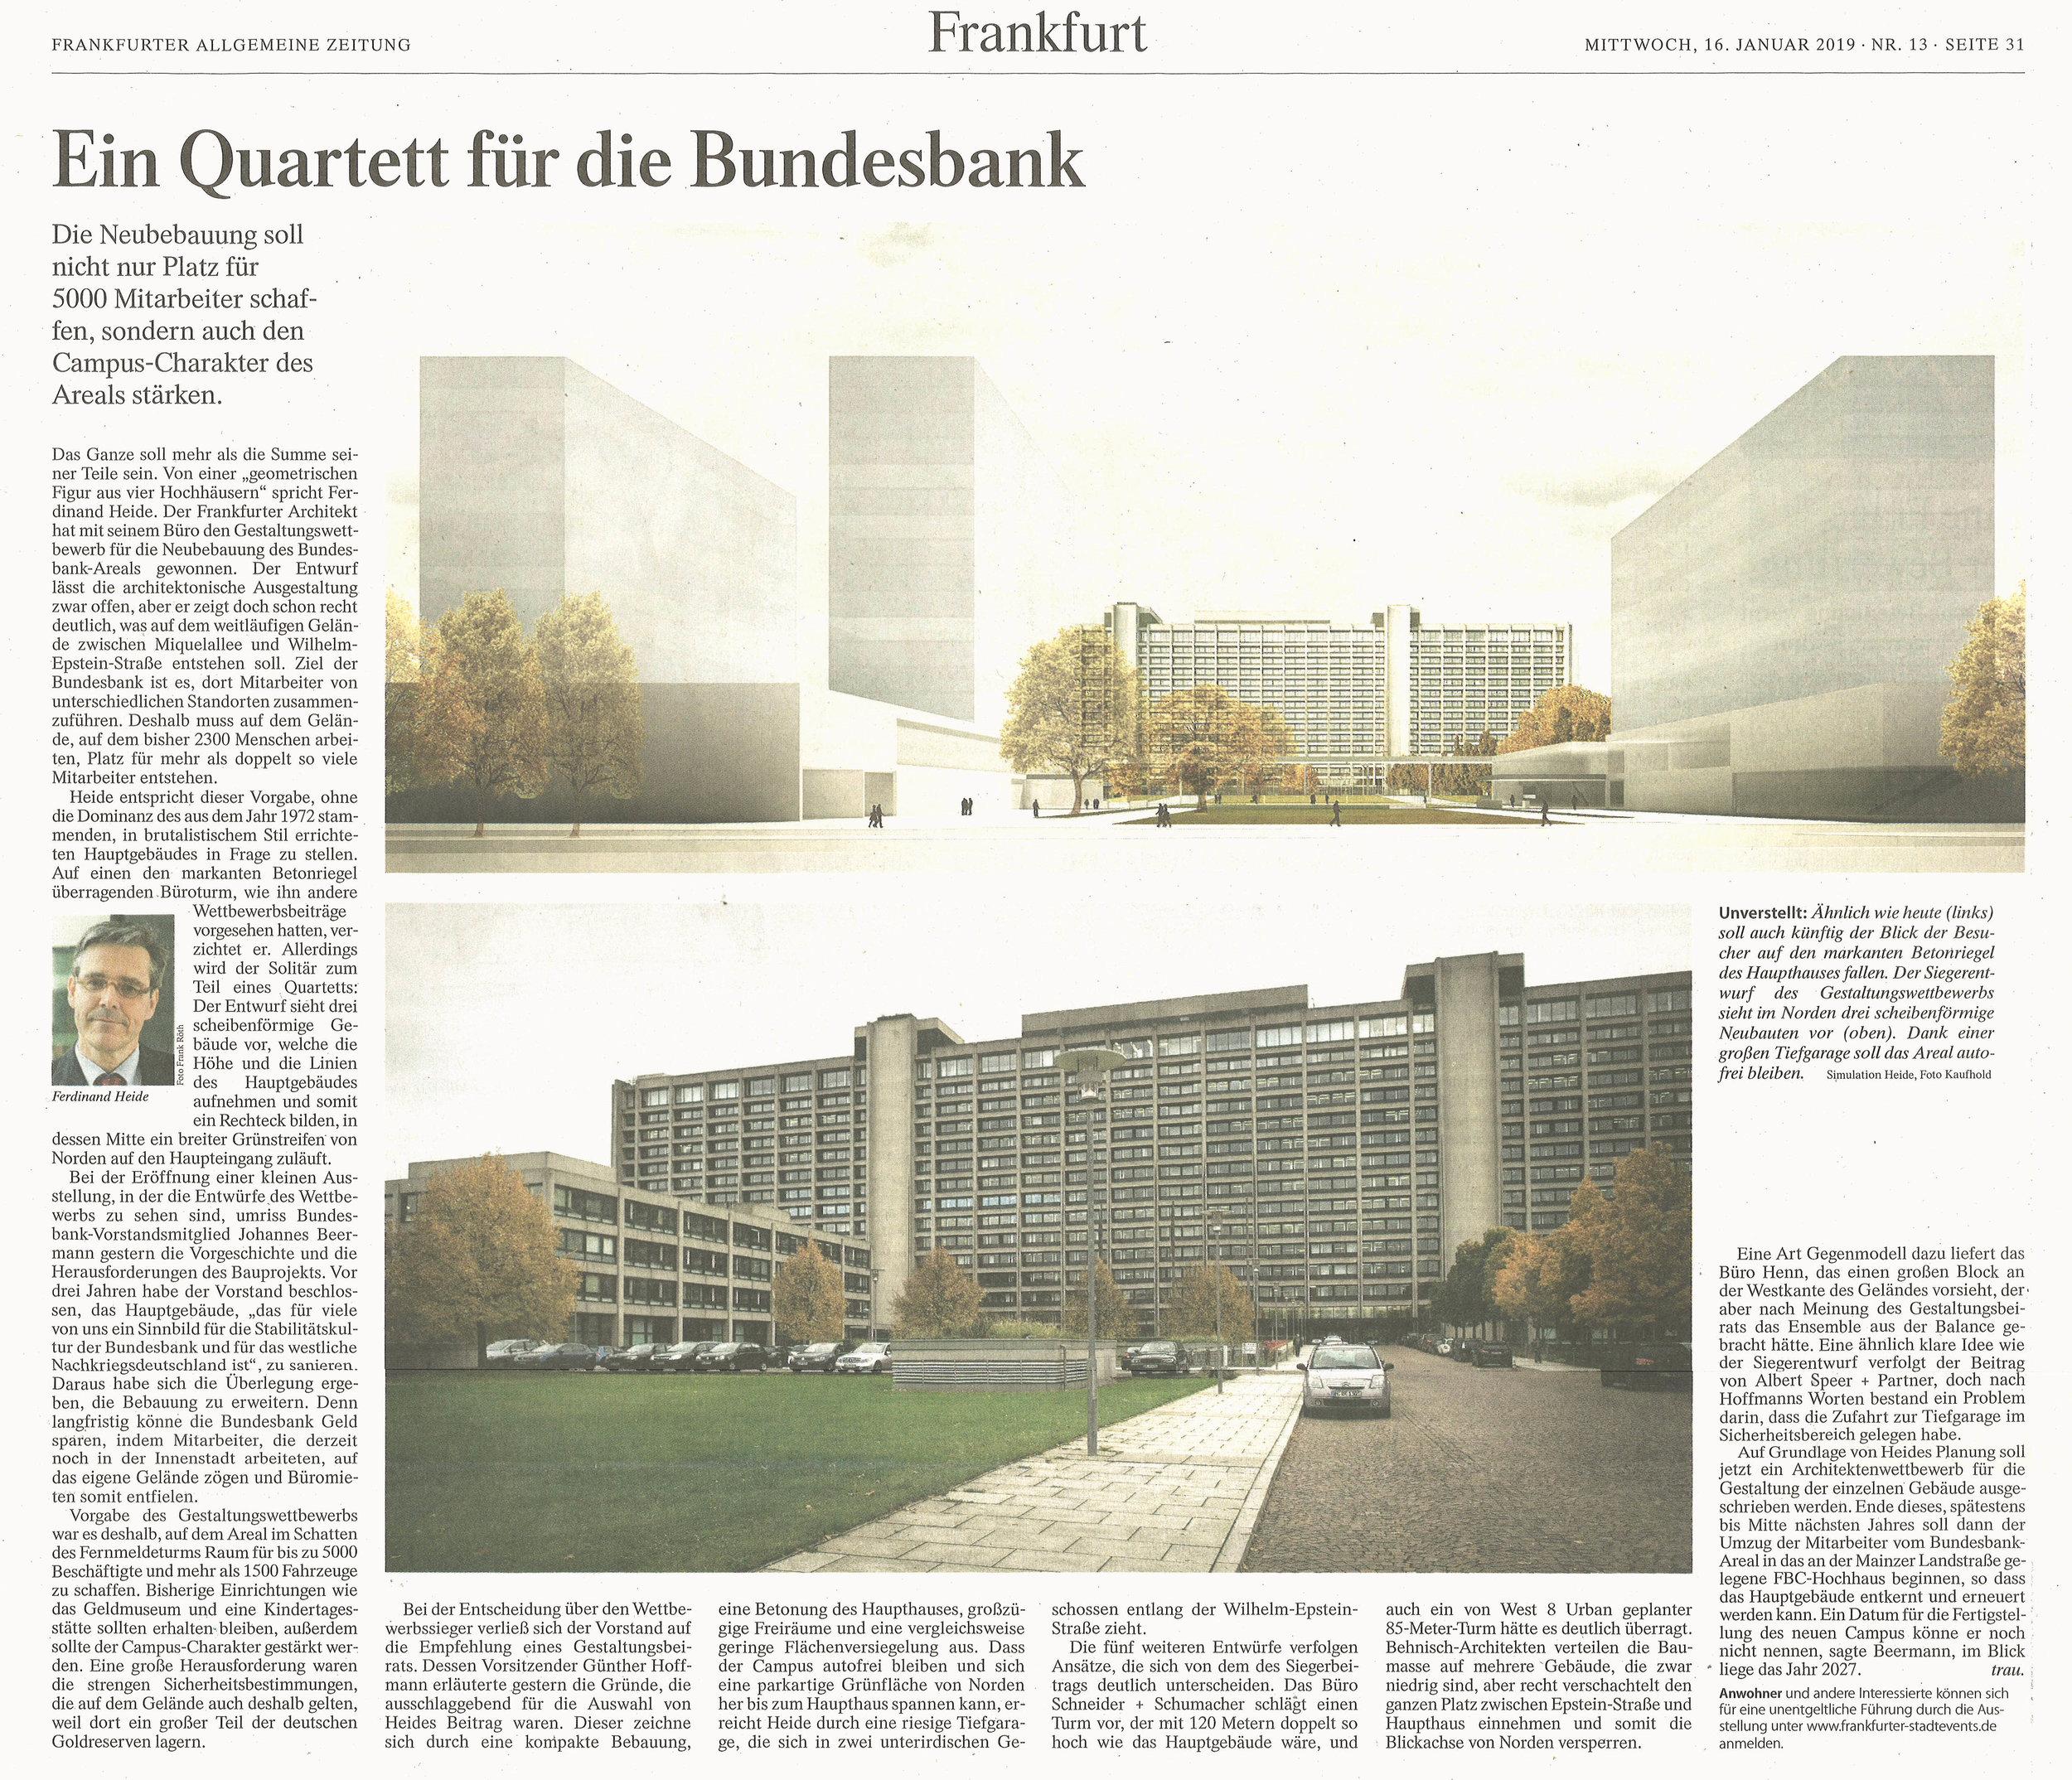 190116_FAZ_Bundesbank_1.jpg